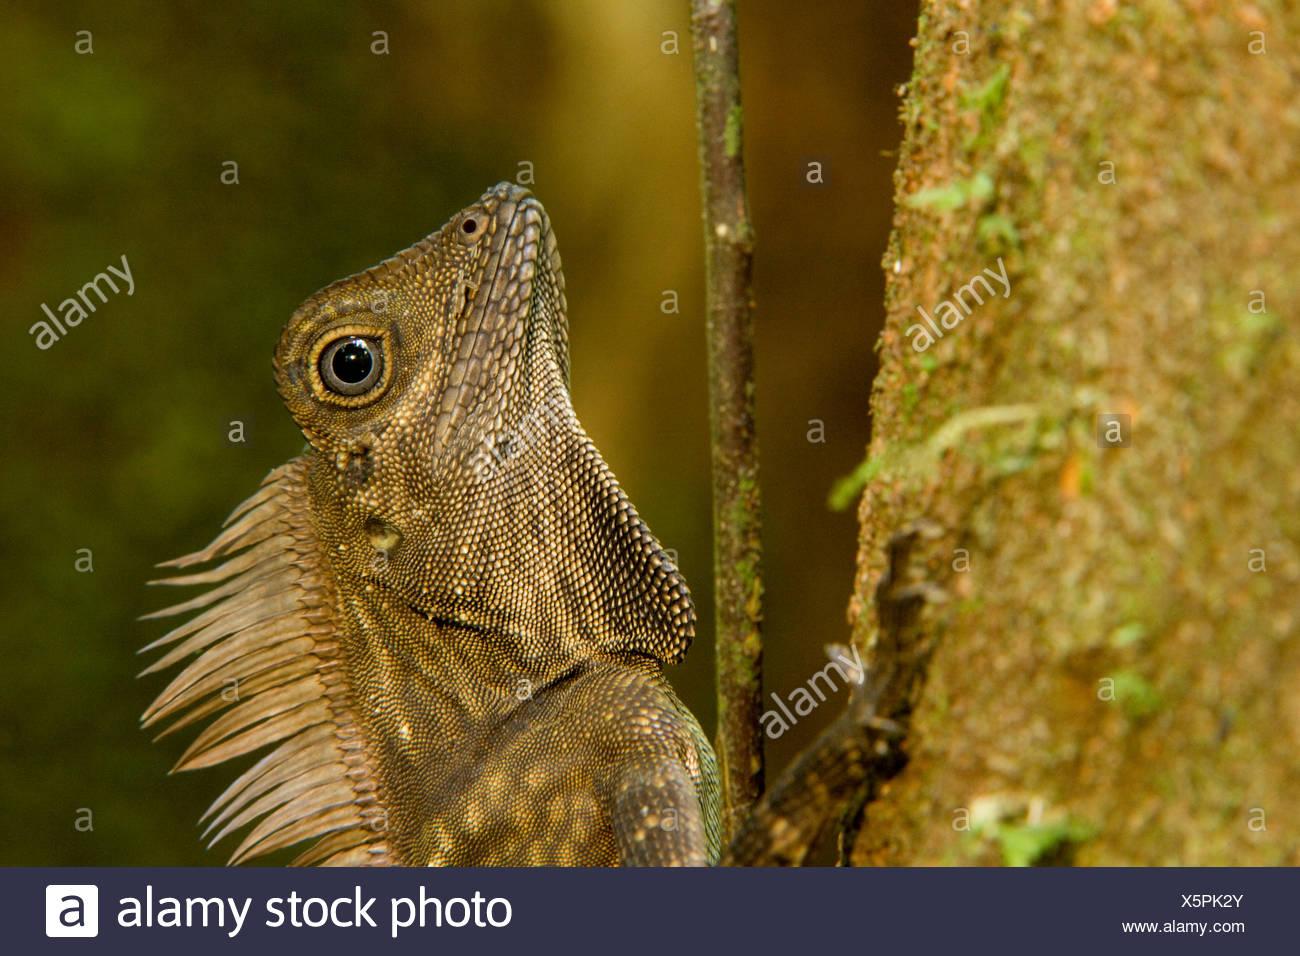 Blue-eyed Angle-headed Lizard (Gonocephalus liogaster) close-up. Stock Photo